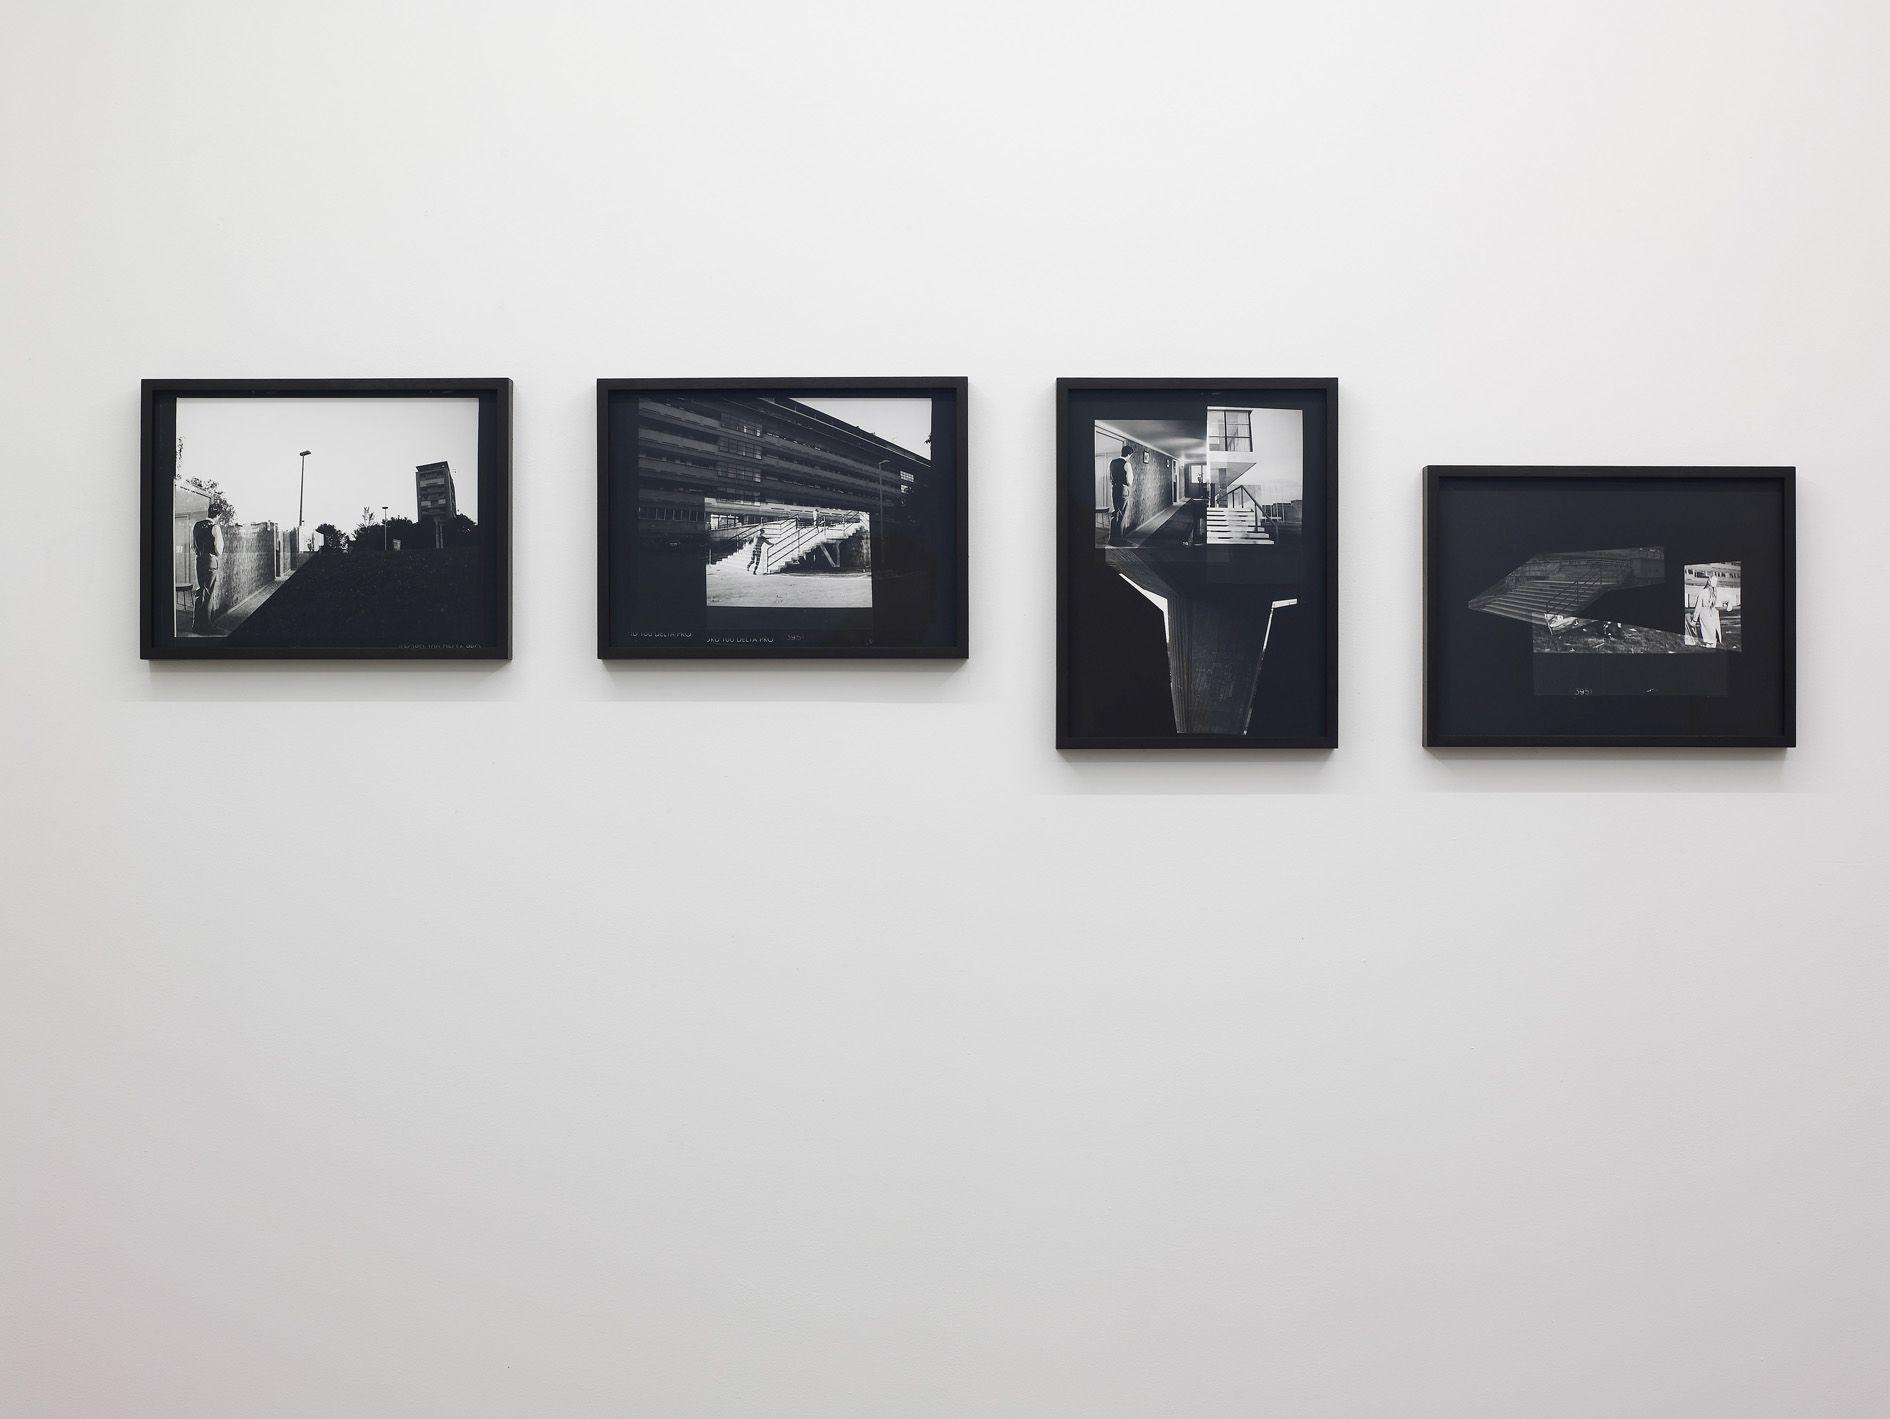 David Maljkovic – Recalling Frames – London